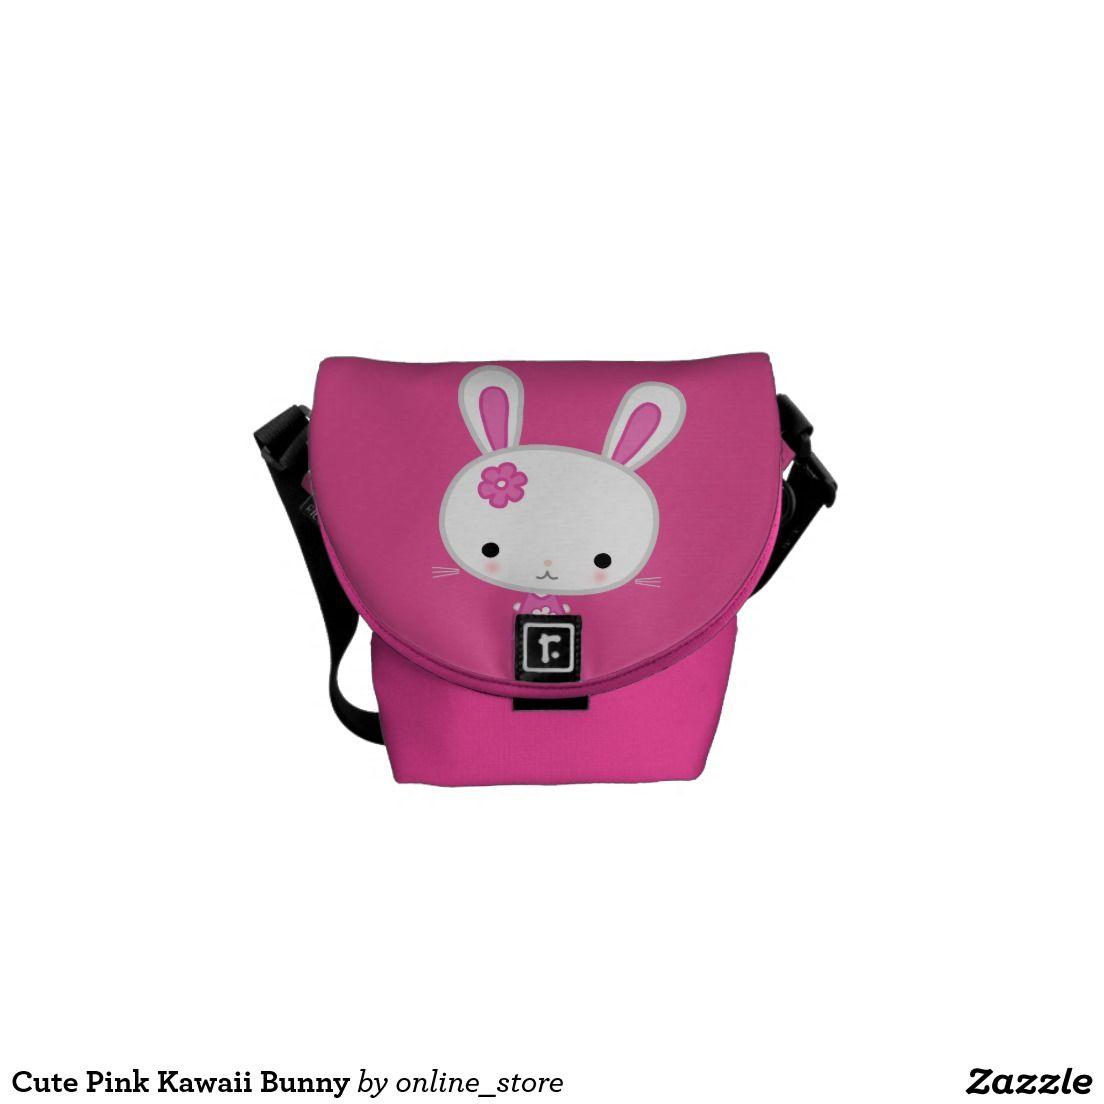 Cute Pink Kawaii Bunny Messenger Bag